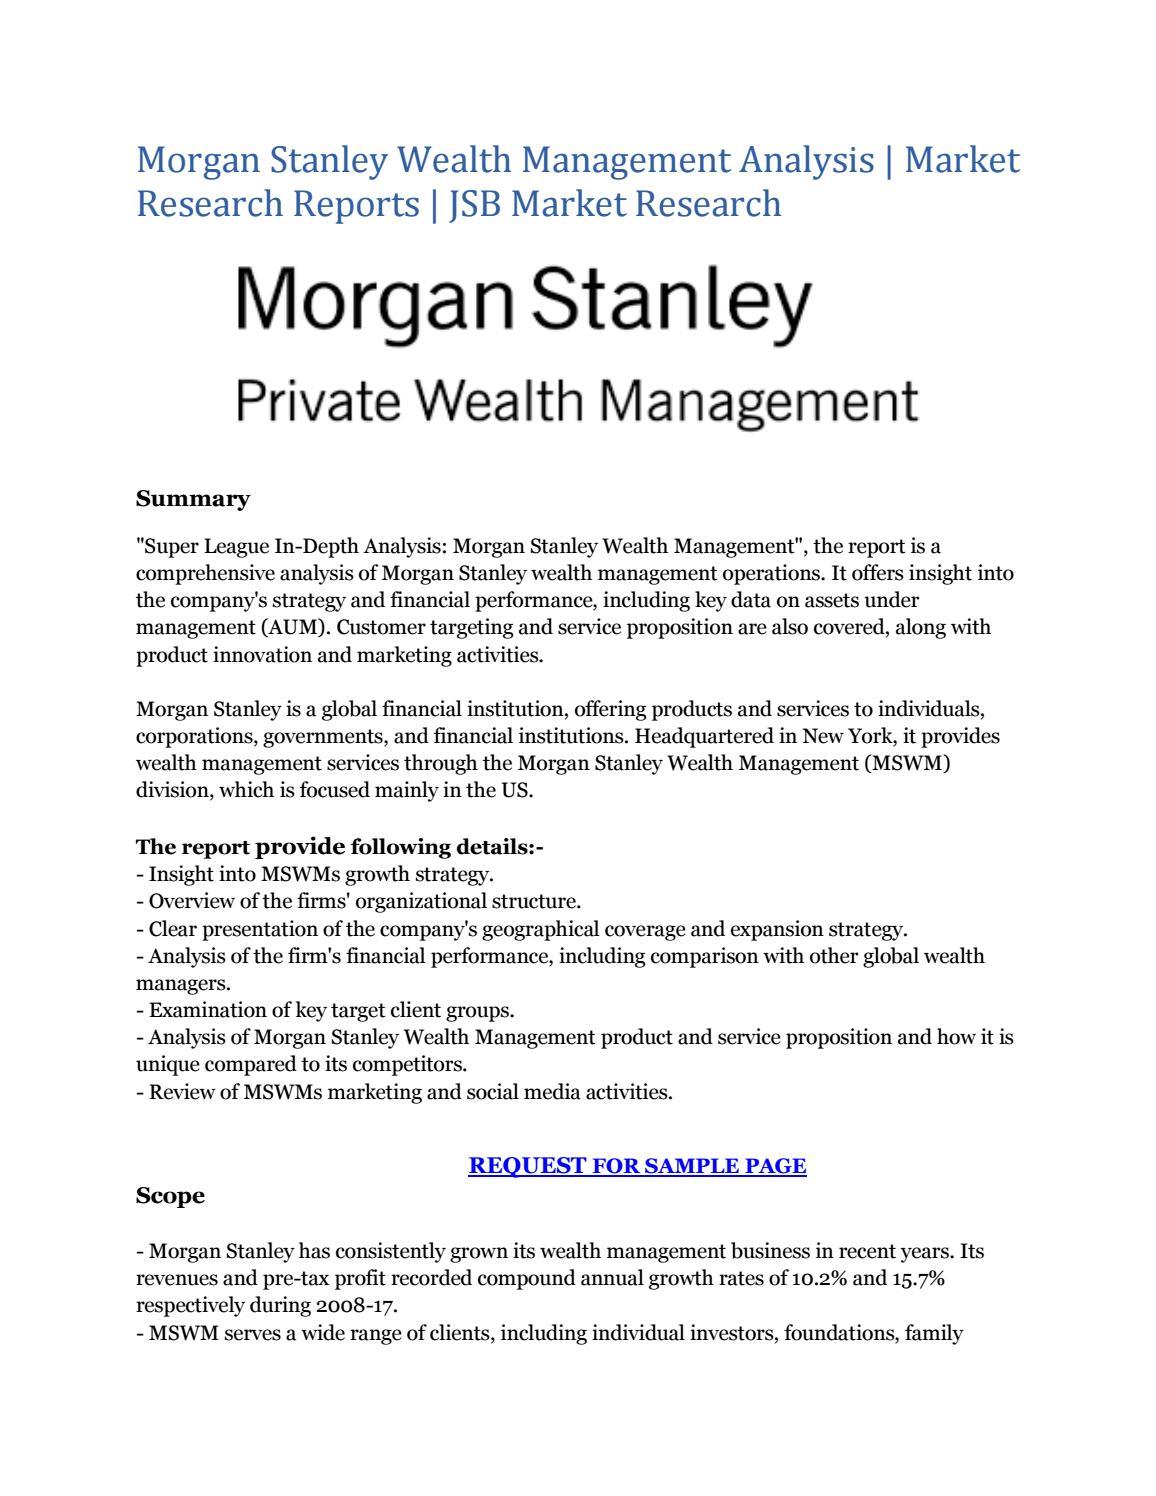 Morgan Stanley Wealth Management Analysis | Market Research